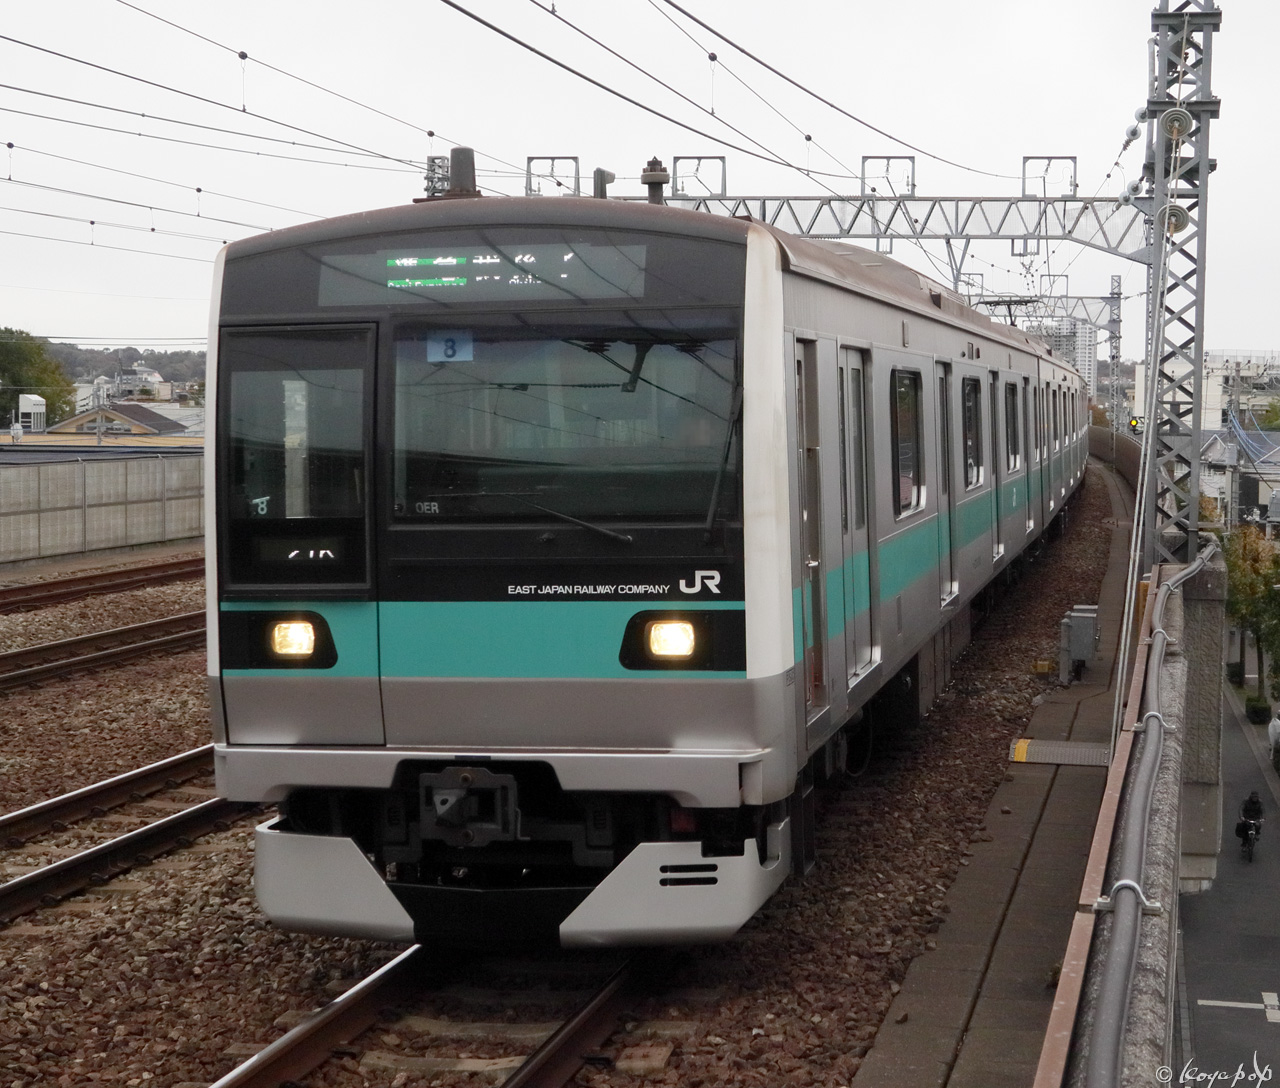 191128C-031x1280 狛江駅単独